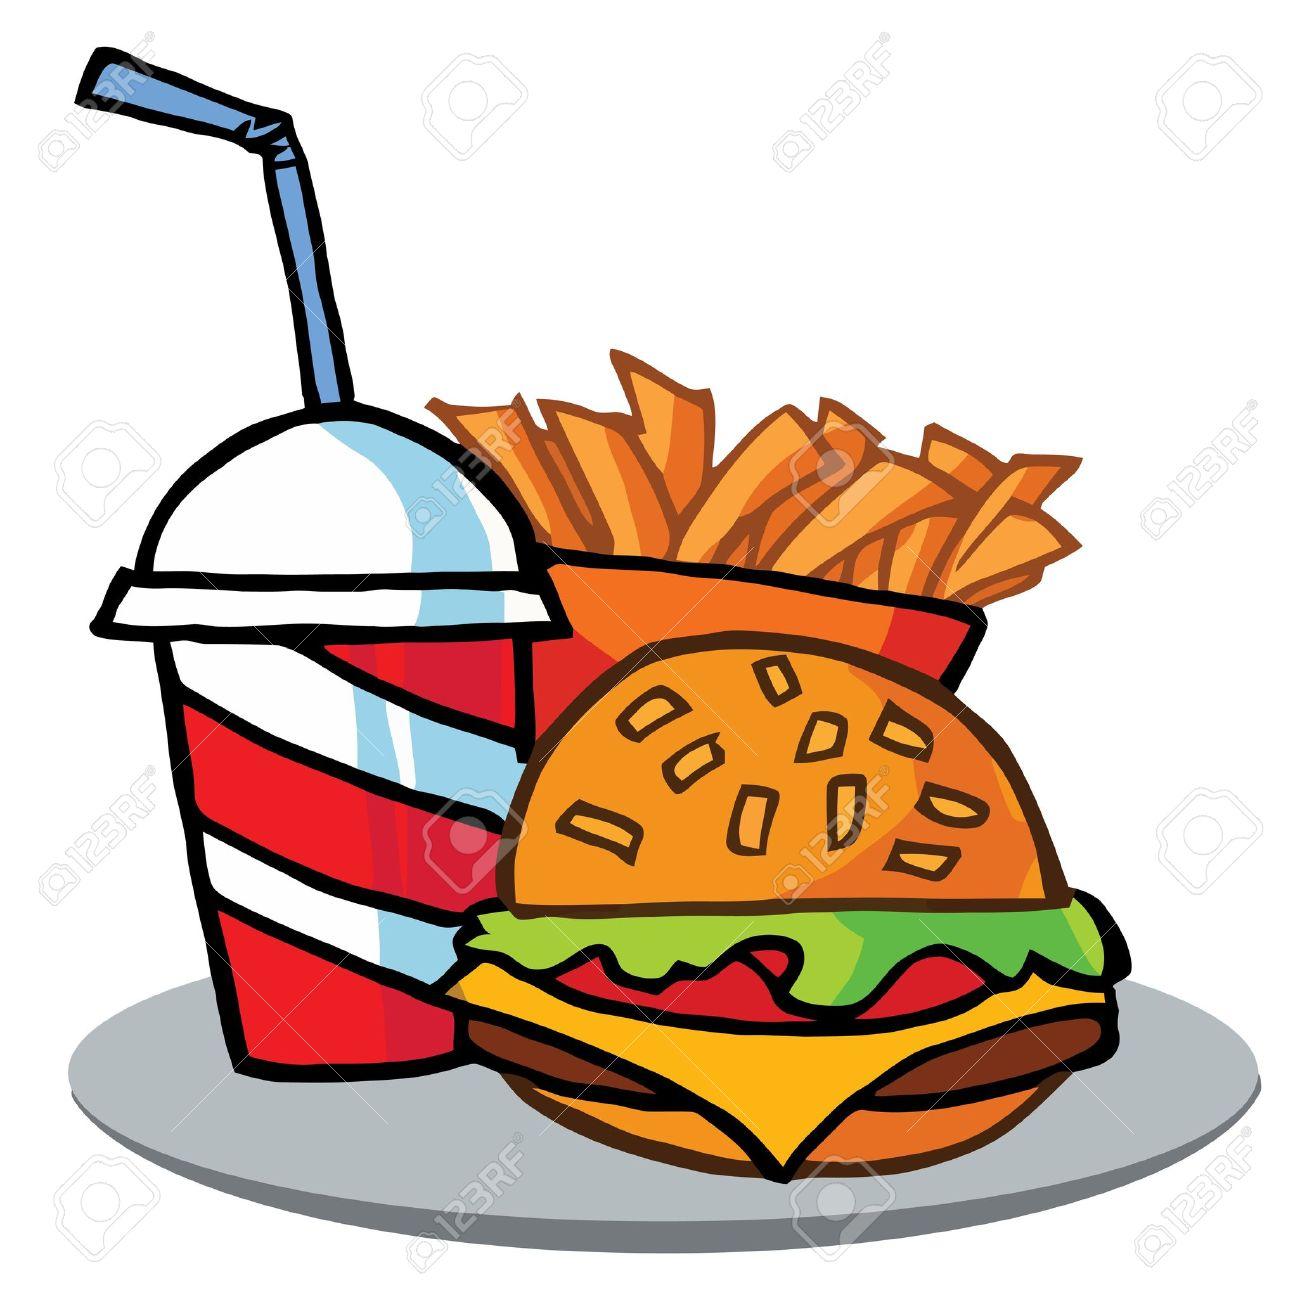 Cola, Fries And Cheeseburger - 6792622